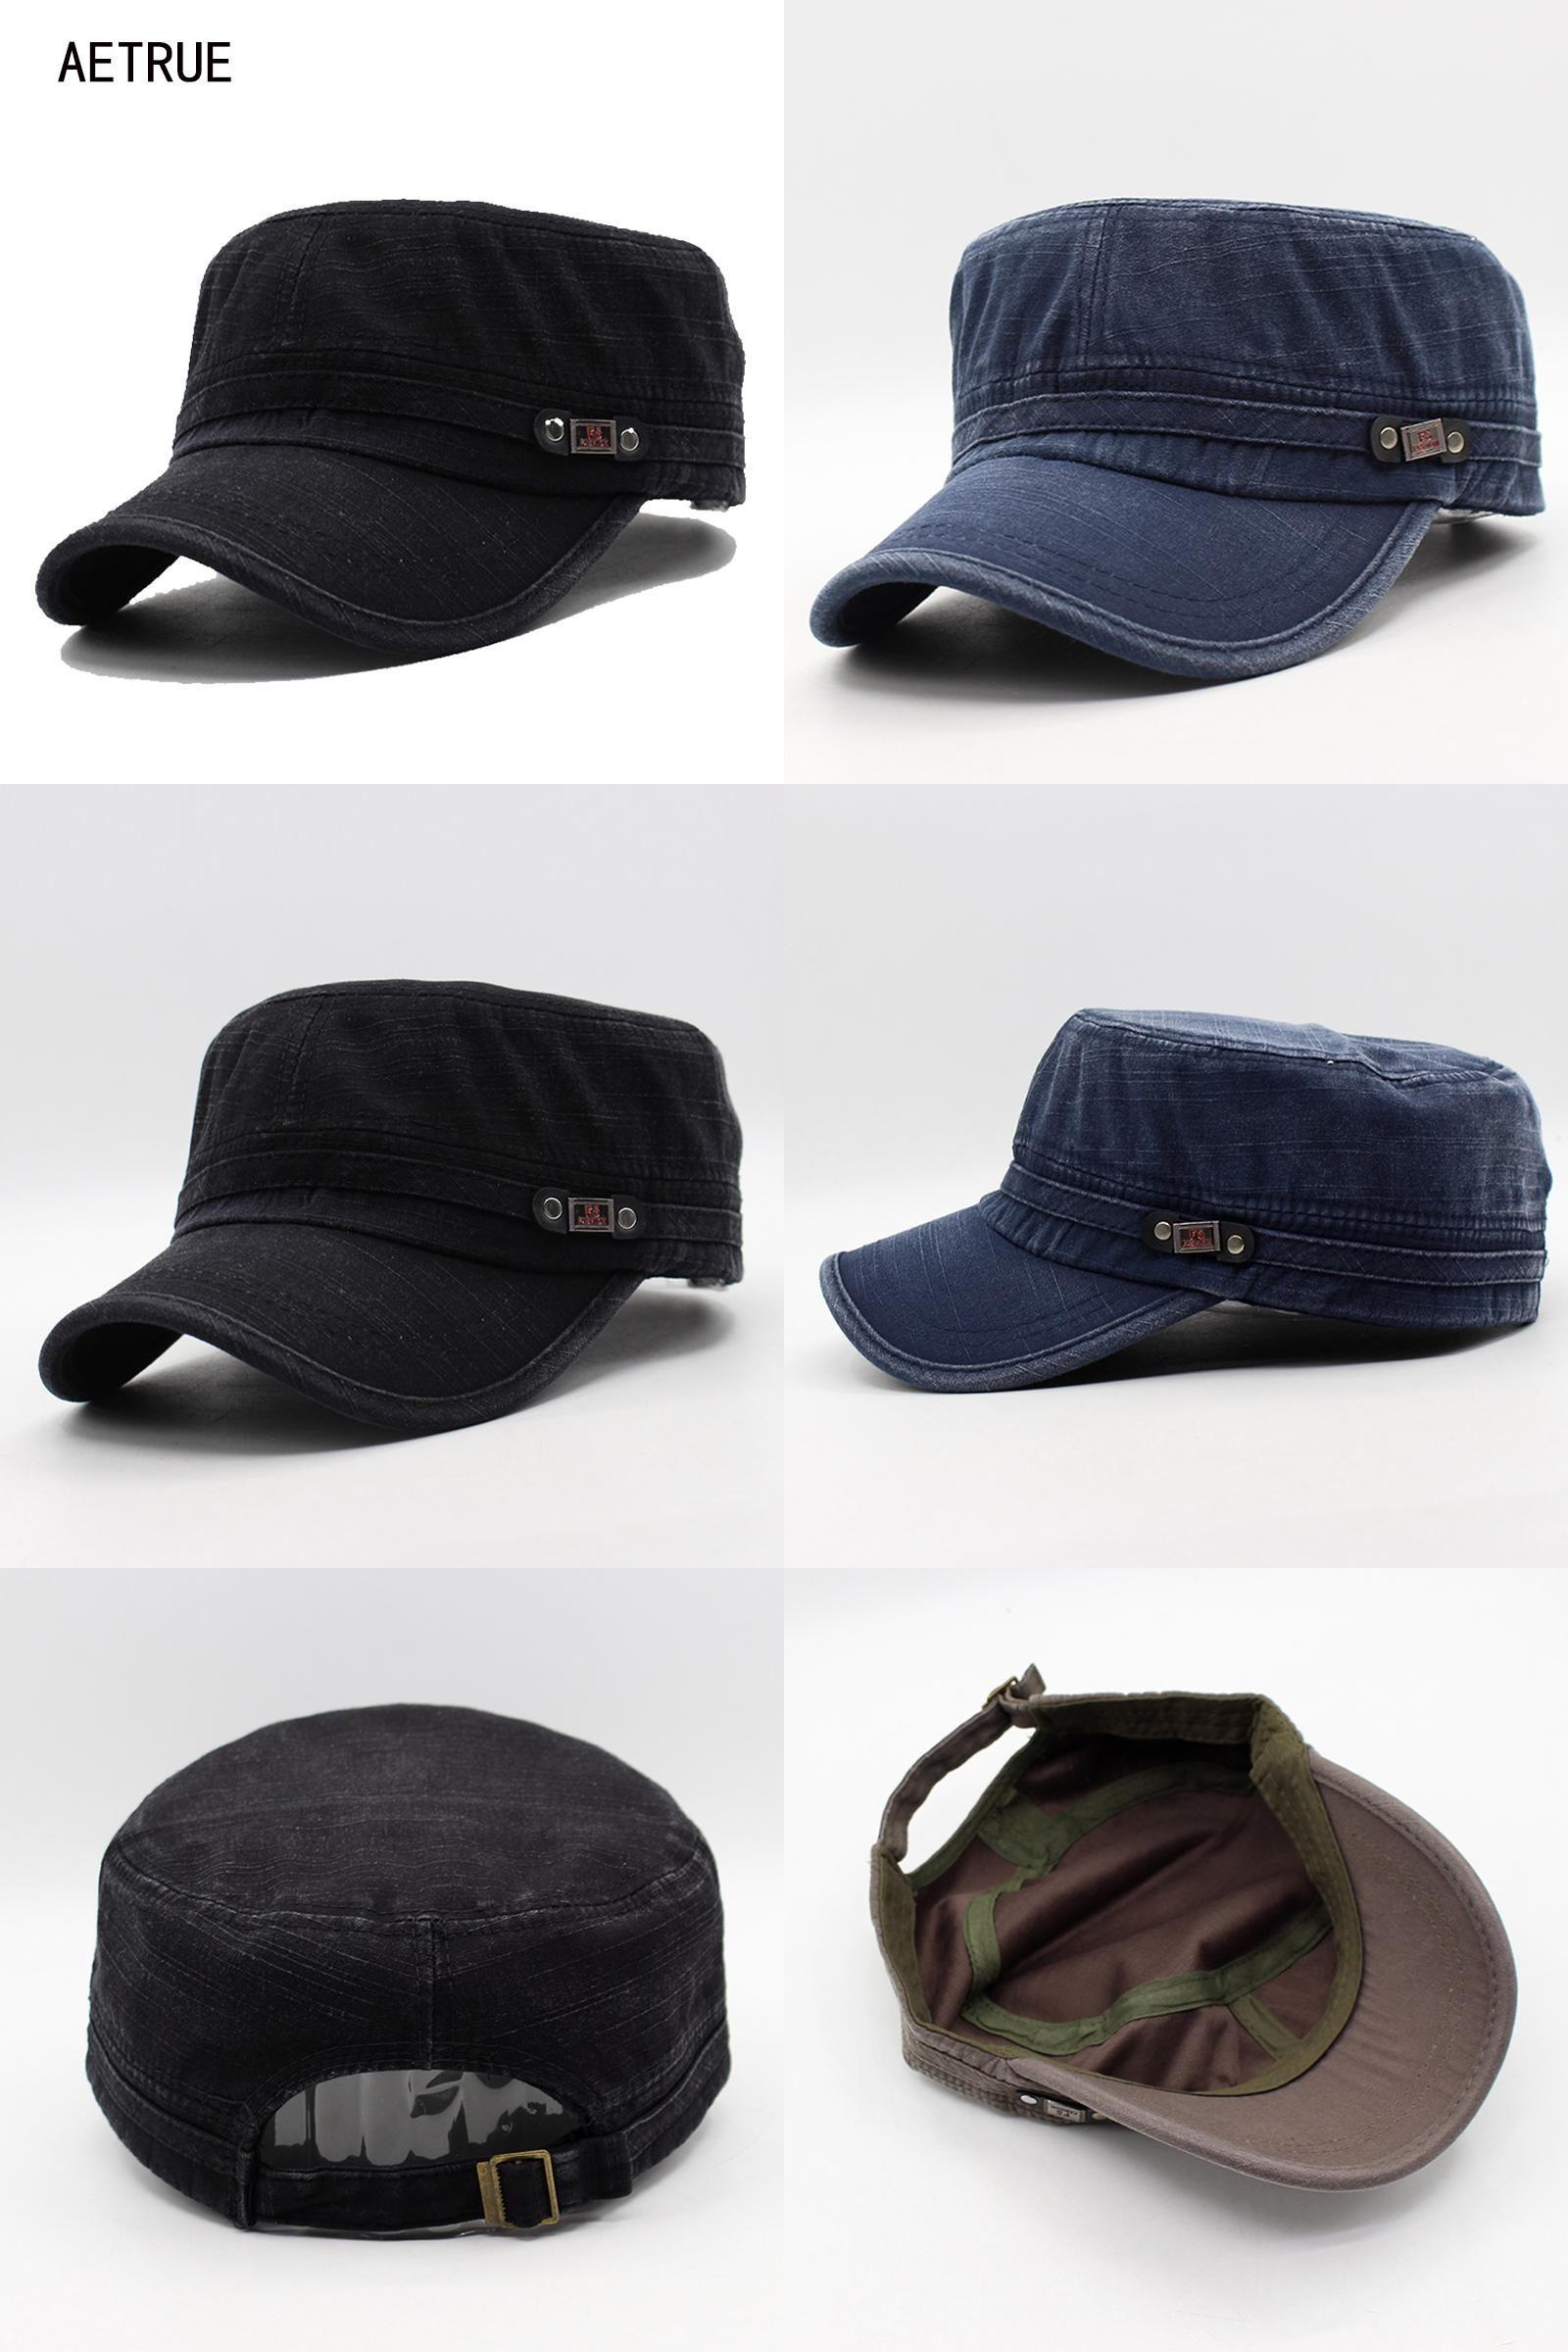 f9a7f906866  Visit to Buy  2017 New Baseball Cap Men Women Fashion Caps Hats For Men